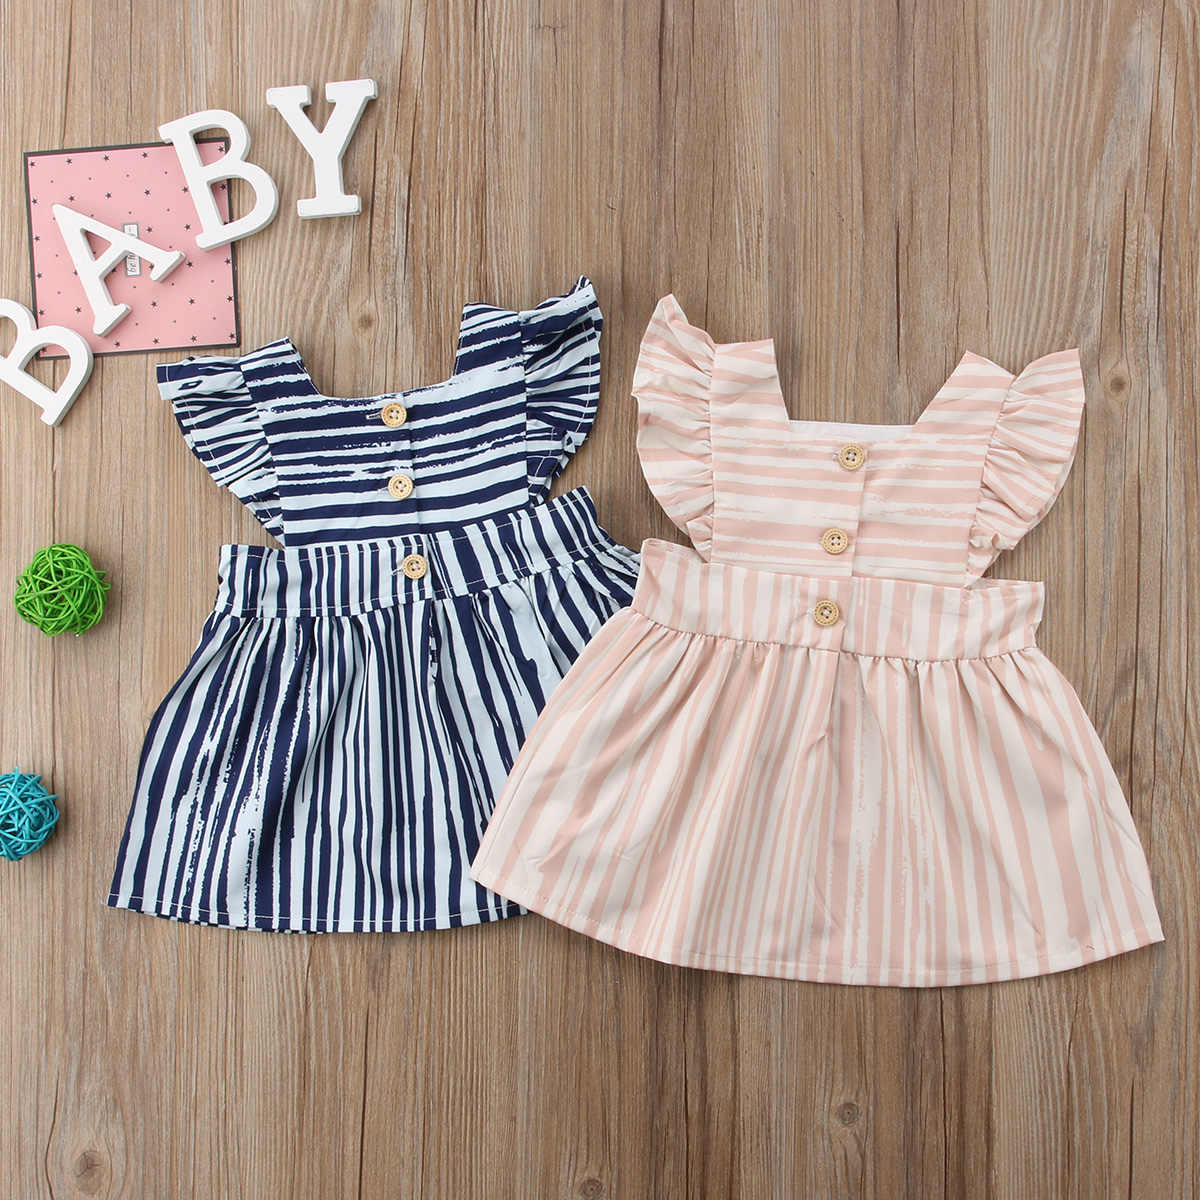 39b6cf07c67b pudcoco Princess Kids Baby Girls Striped Dress Party Bridesmaid Dresses  Sundress Clothes baby girl spring summer